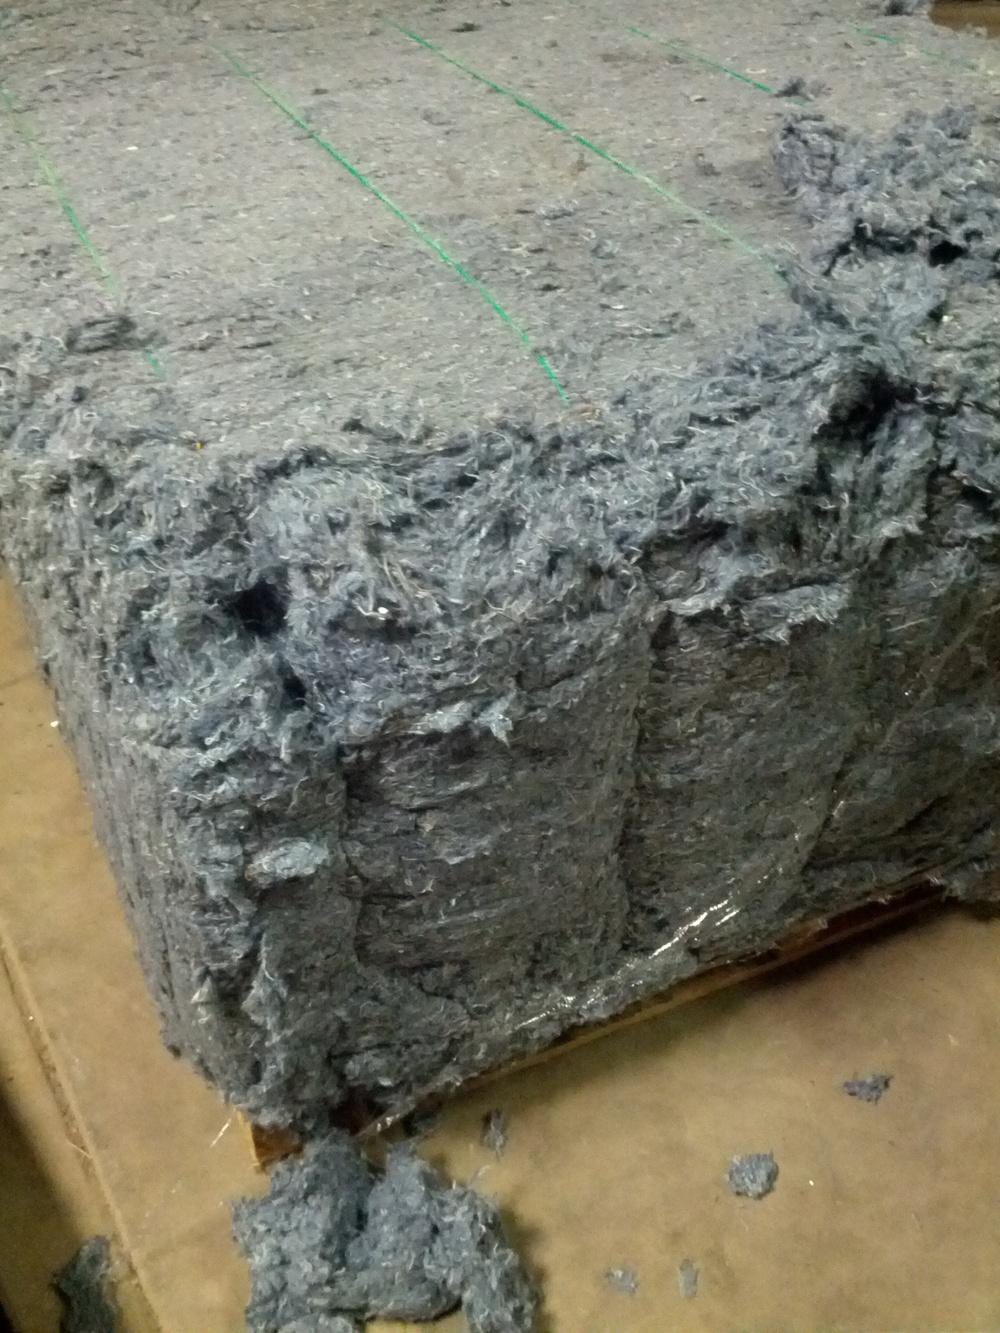 Denim shredded textile bale - 700 lbs.